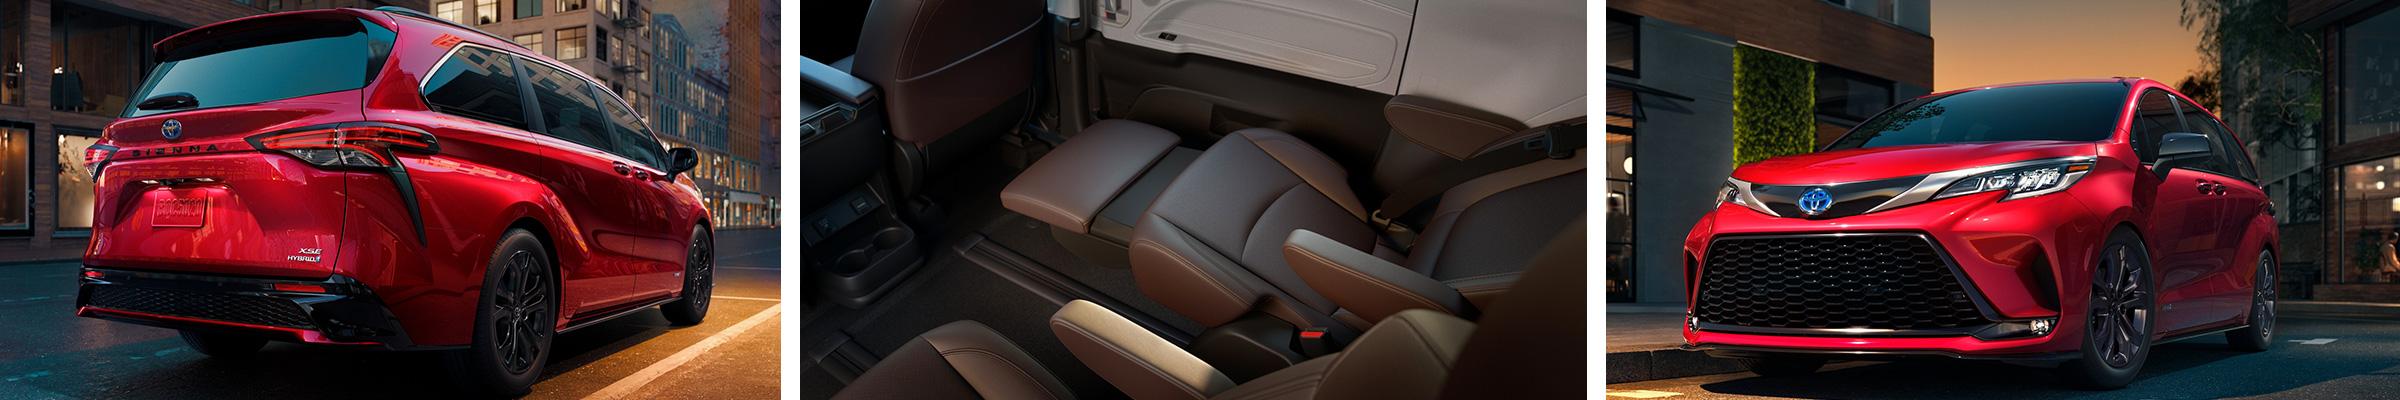 2021 Toyota Sienna For Sale Savannah GA   Chatham County